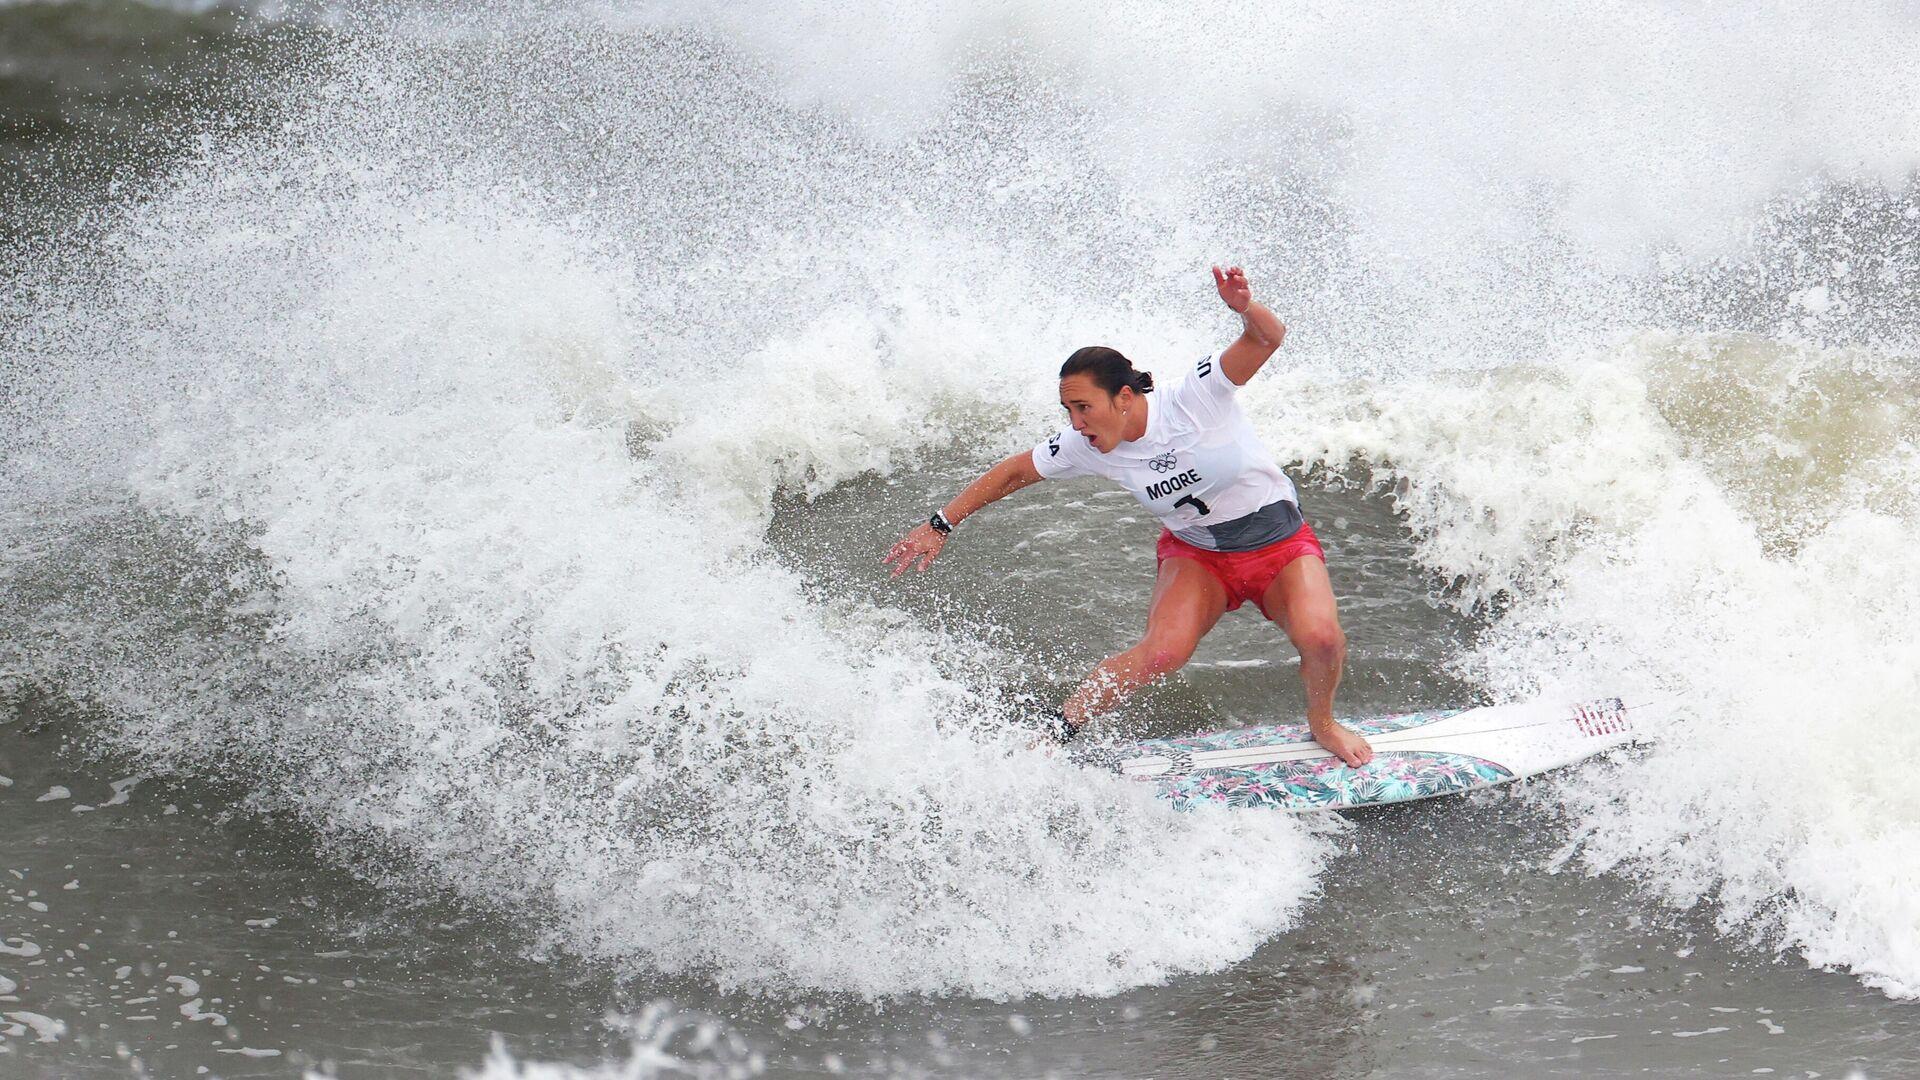 Американская серфингистка Карисса Мур на Олимпийских играх в Токио - РИА Новости, 1920, 27.07.2021